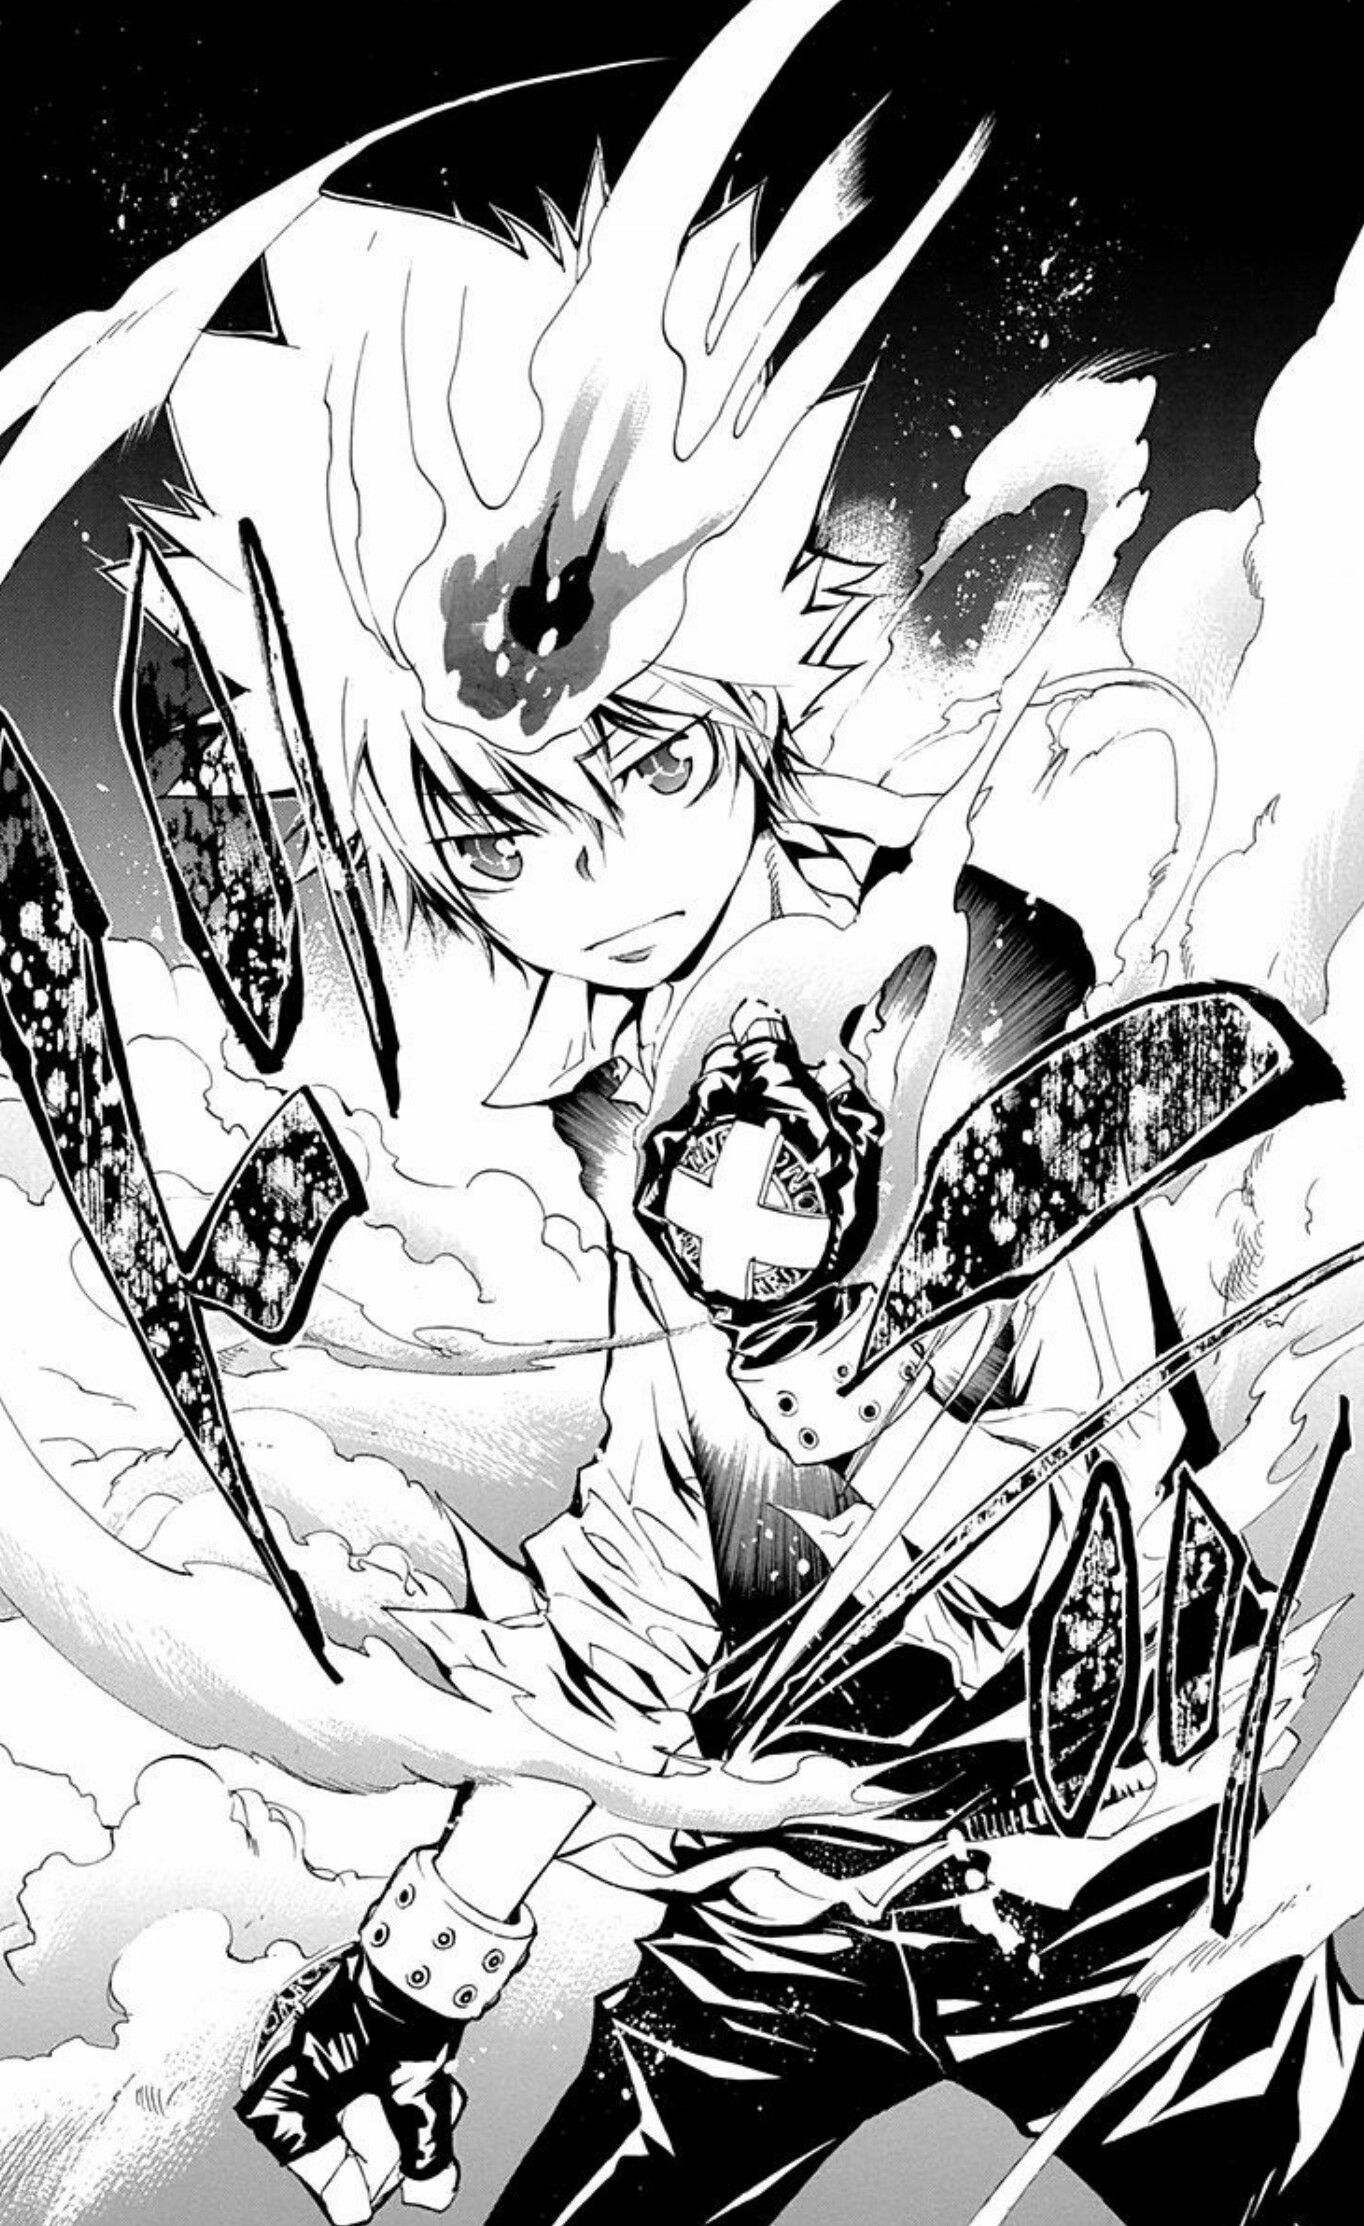 Pin By Mika A On Katyekus Nitmai Yayevsyai Reborn Katekyo Hitman Hitman Reborn Anime